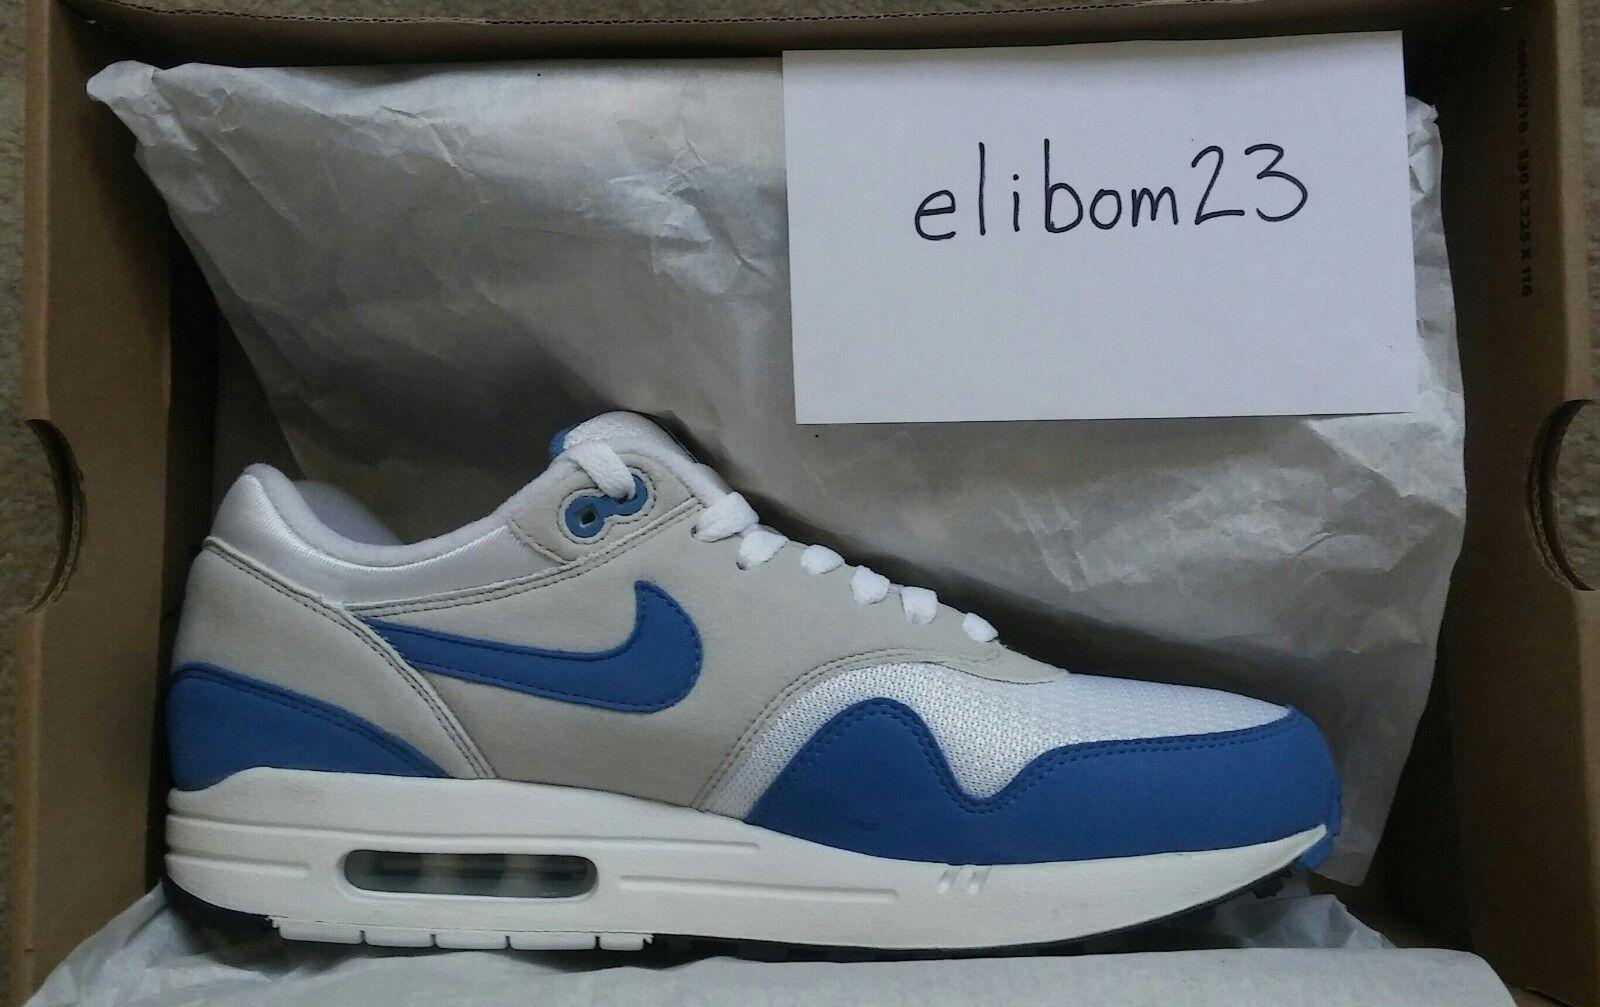 DS 2009 Nike Air Max 1 QS Varsity bluee 378830 141 Sz 9.5 Supreme Parra Patta